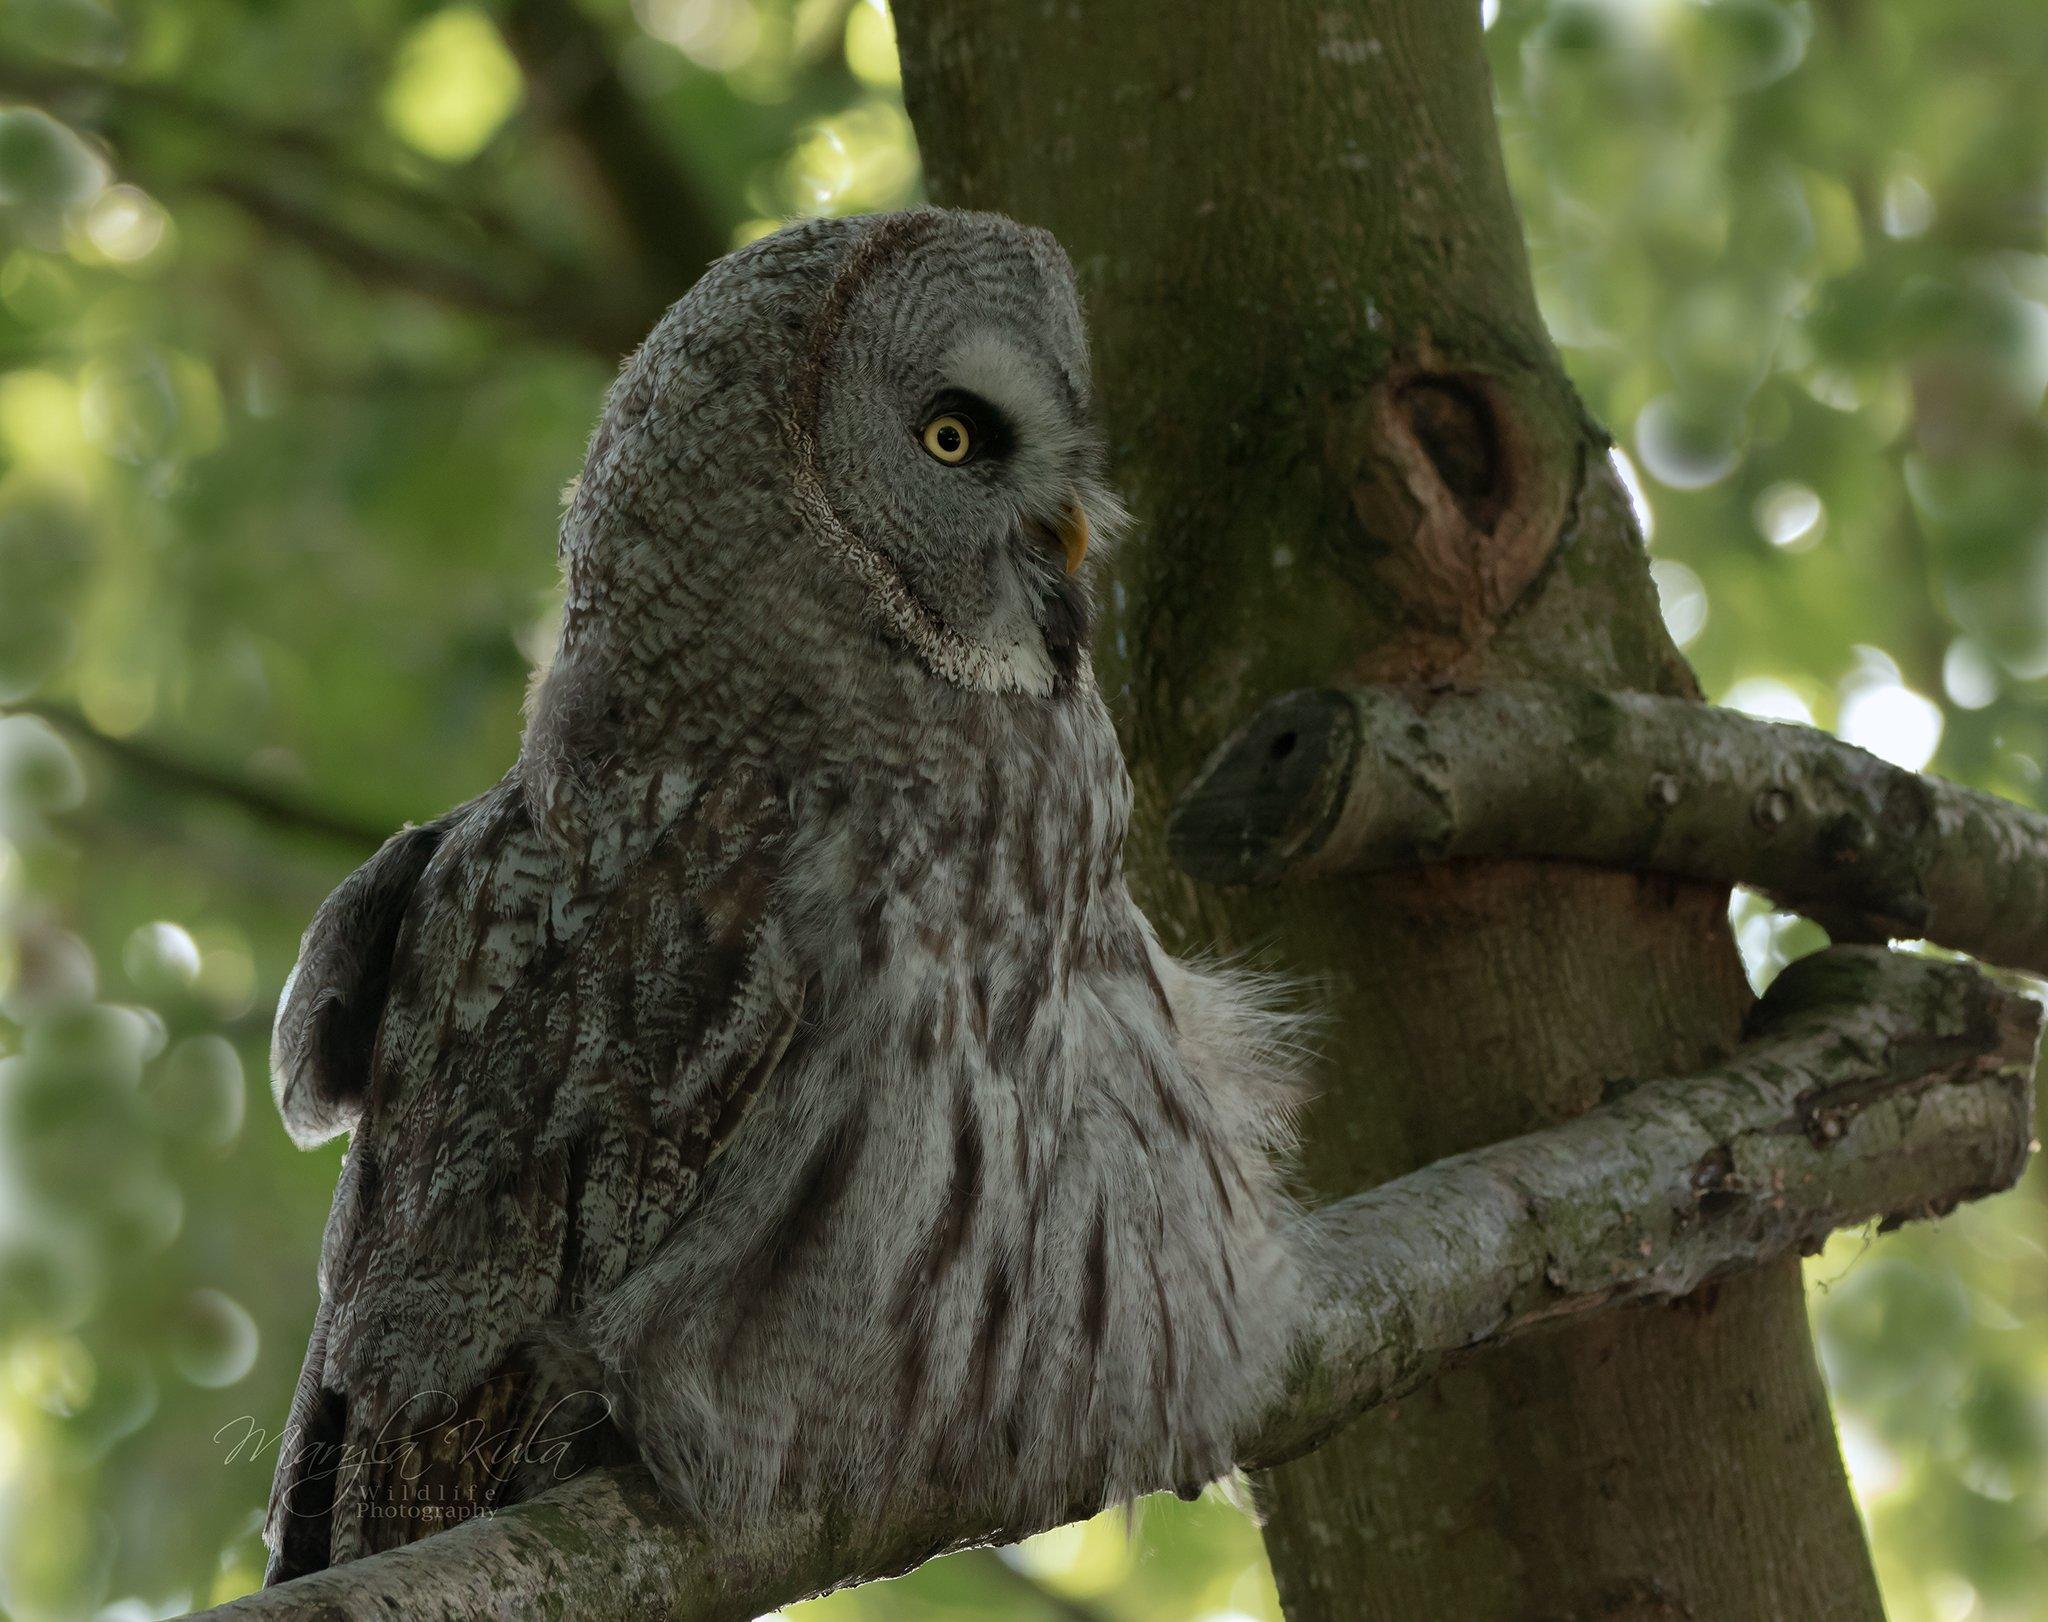 greatgreyowl, owl, birds, birds of prey, nature, wildlife, canon, sigma, MARIA KULA